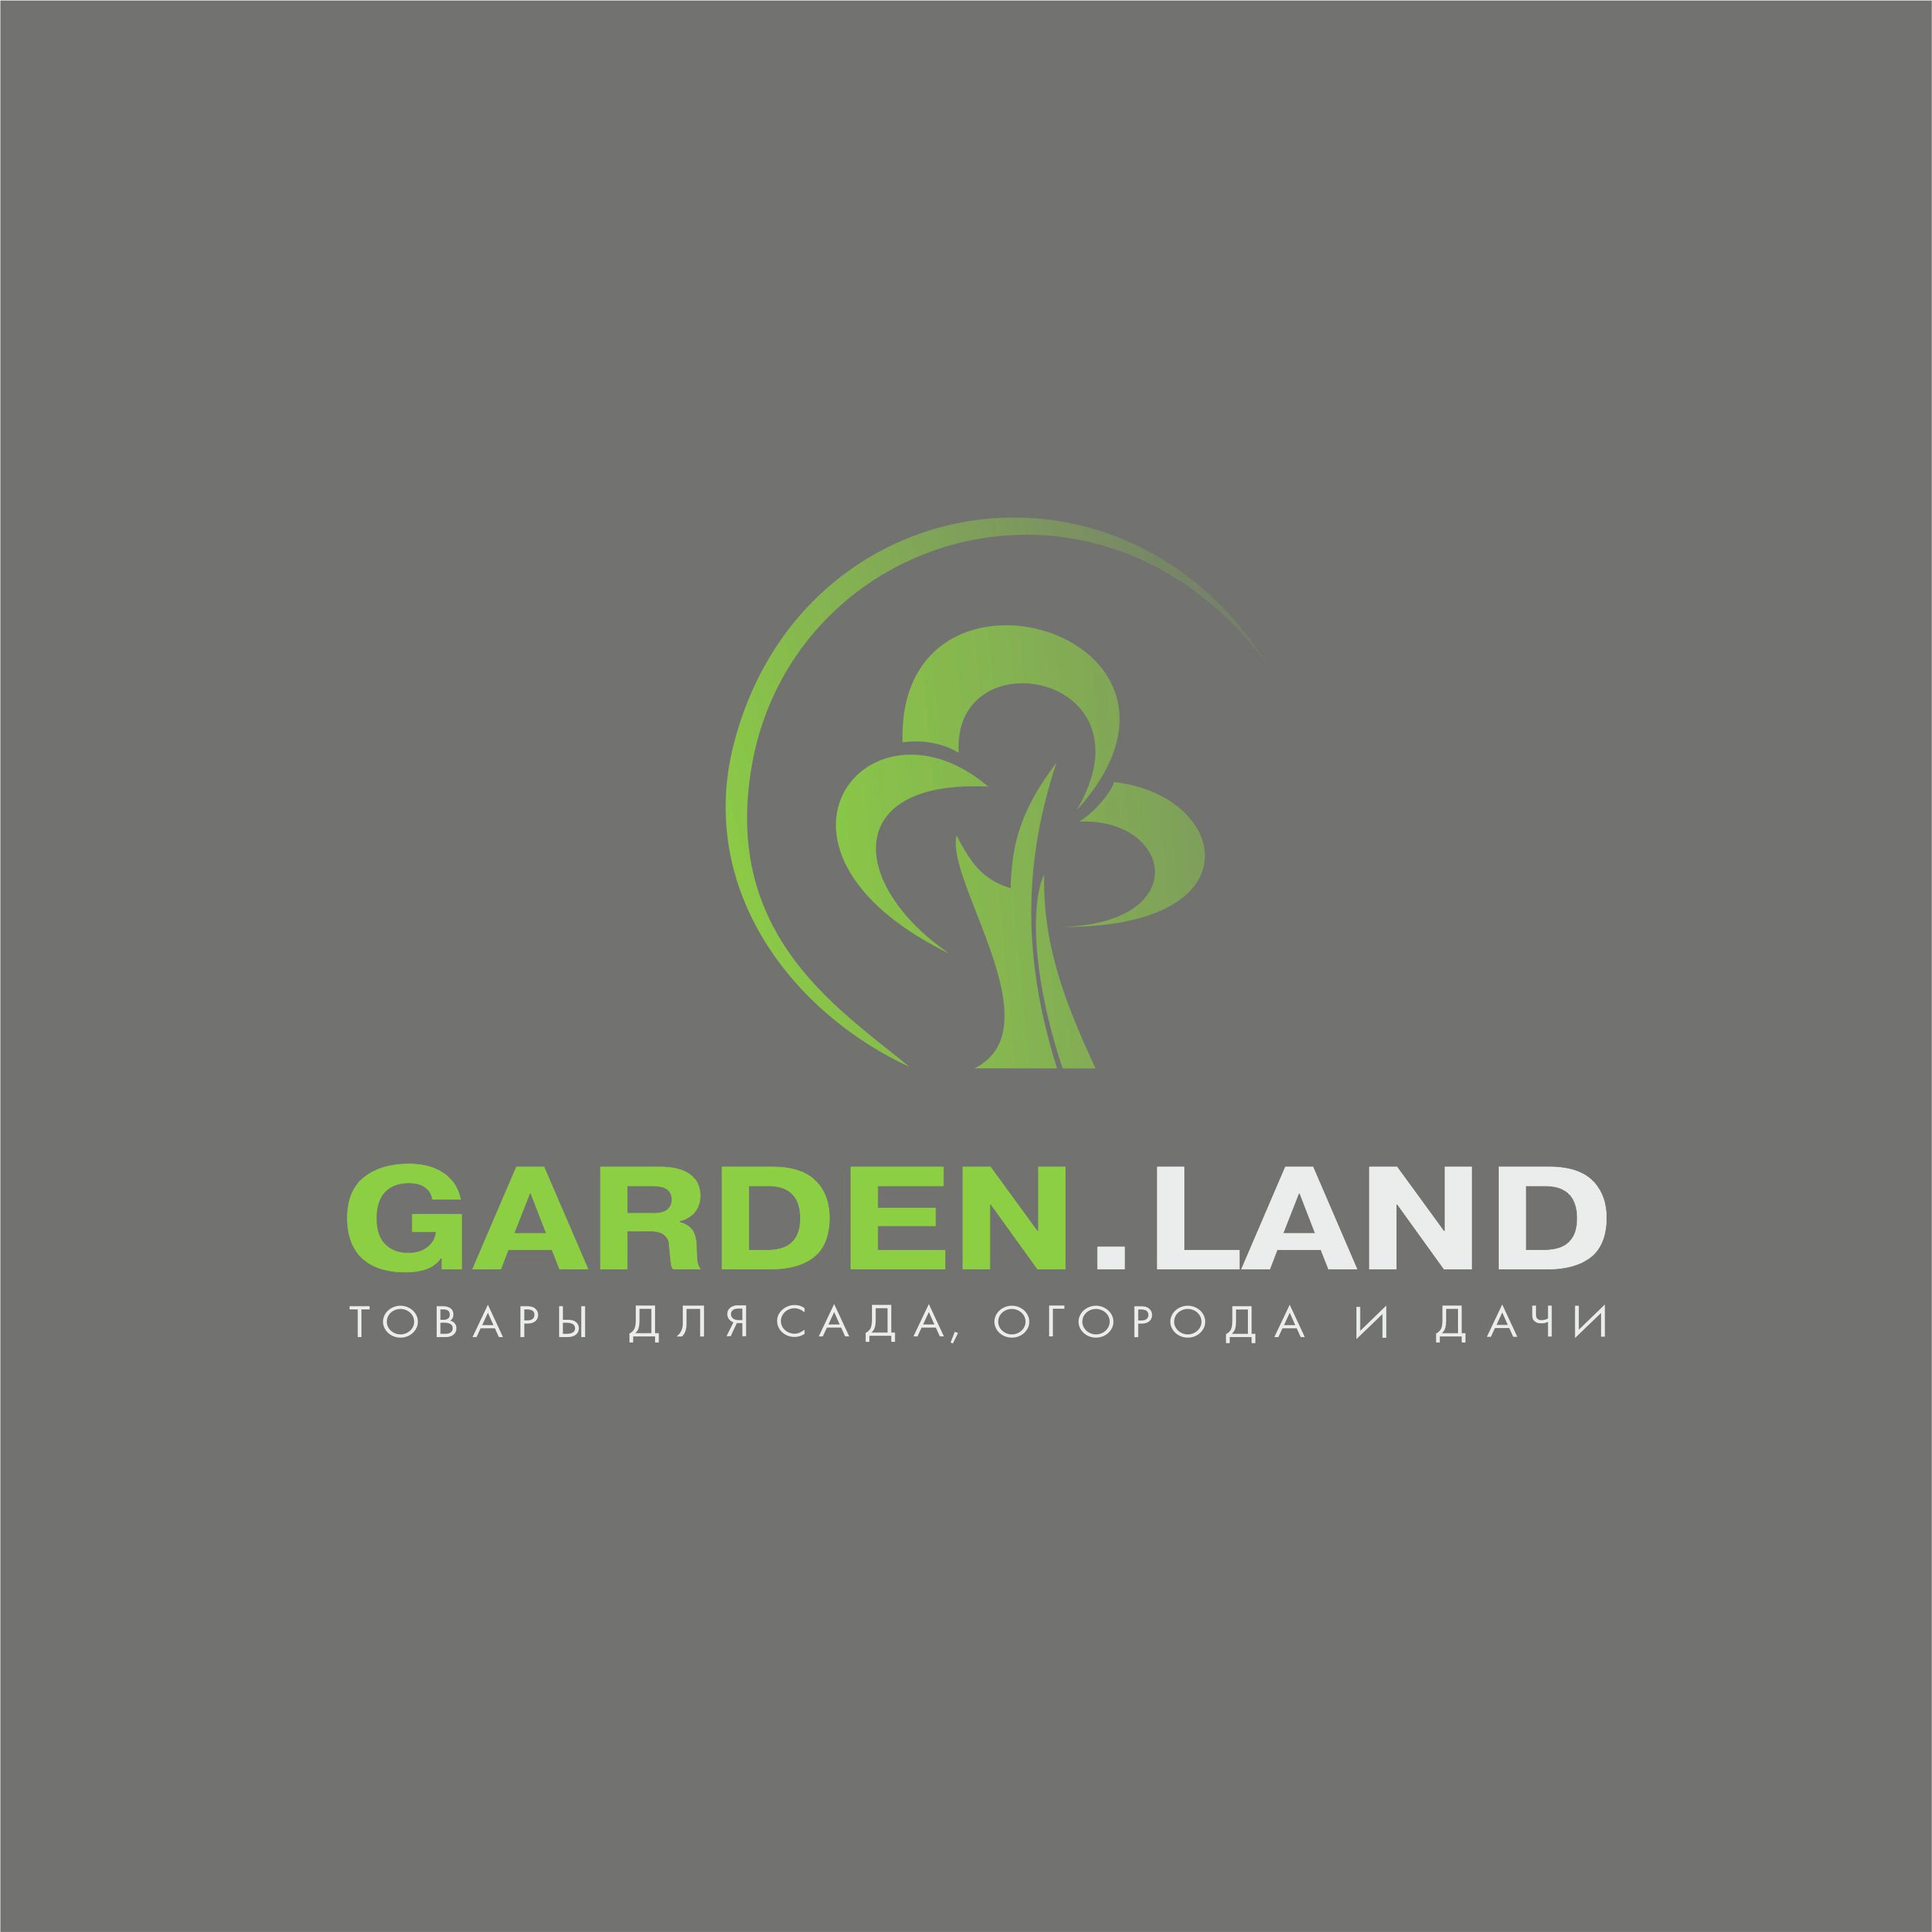 Создание логотипа компании Garden.Land фото f_7915986e7a0a6288.jpg